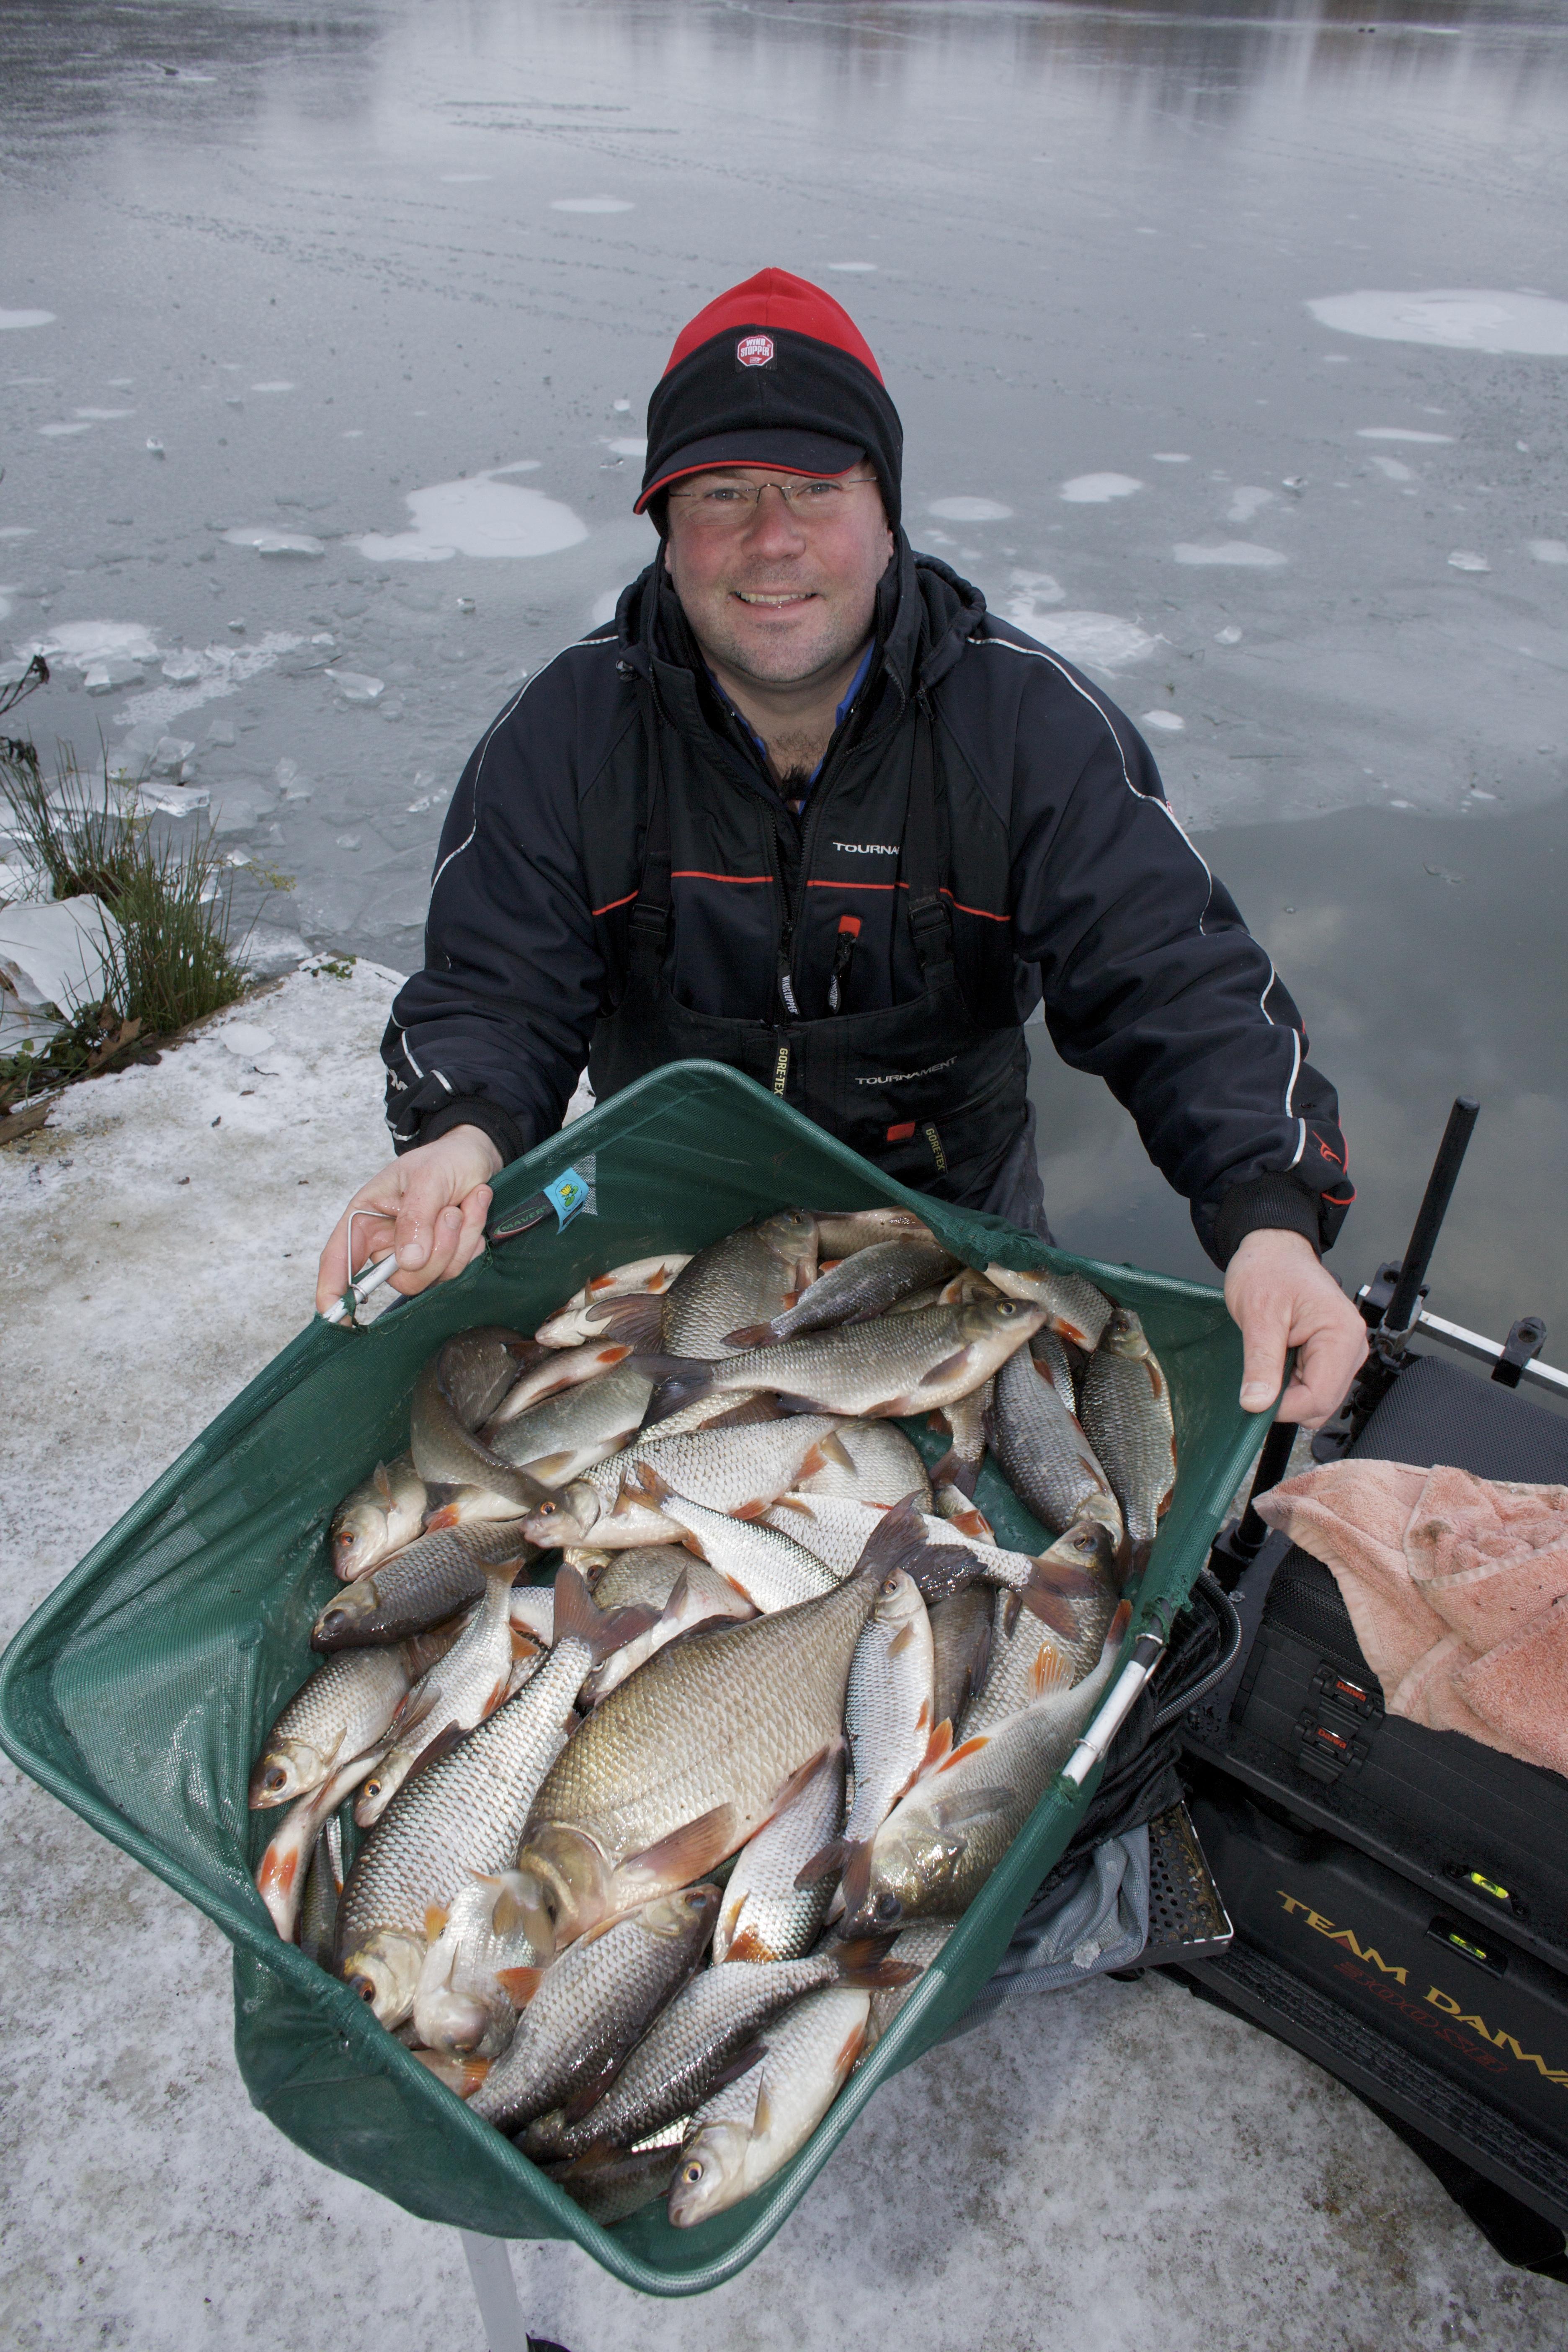 PLEASURE BLOG (Sun): Get Ready For Some N-ice Eskimo